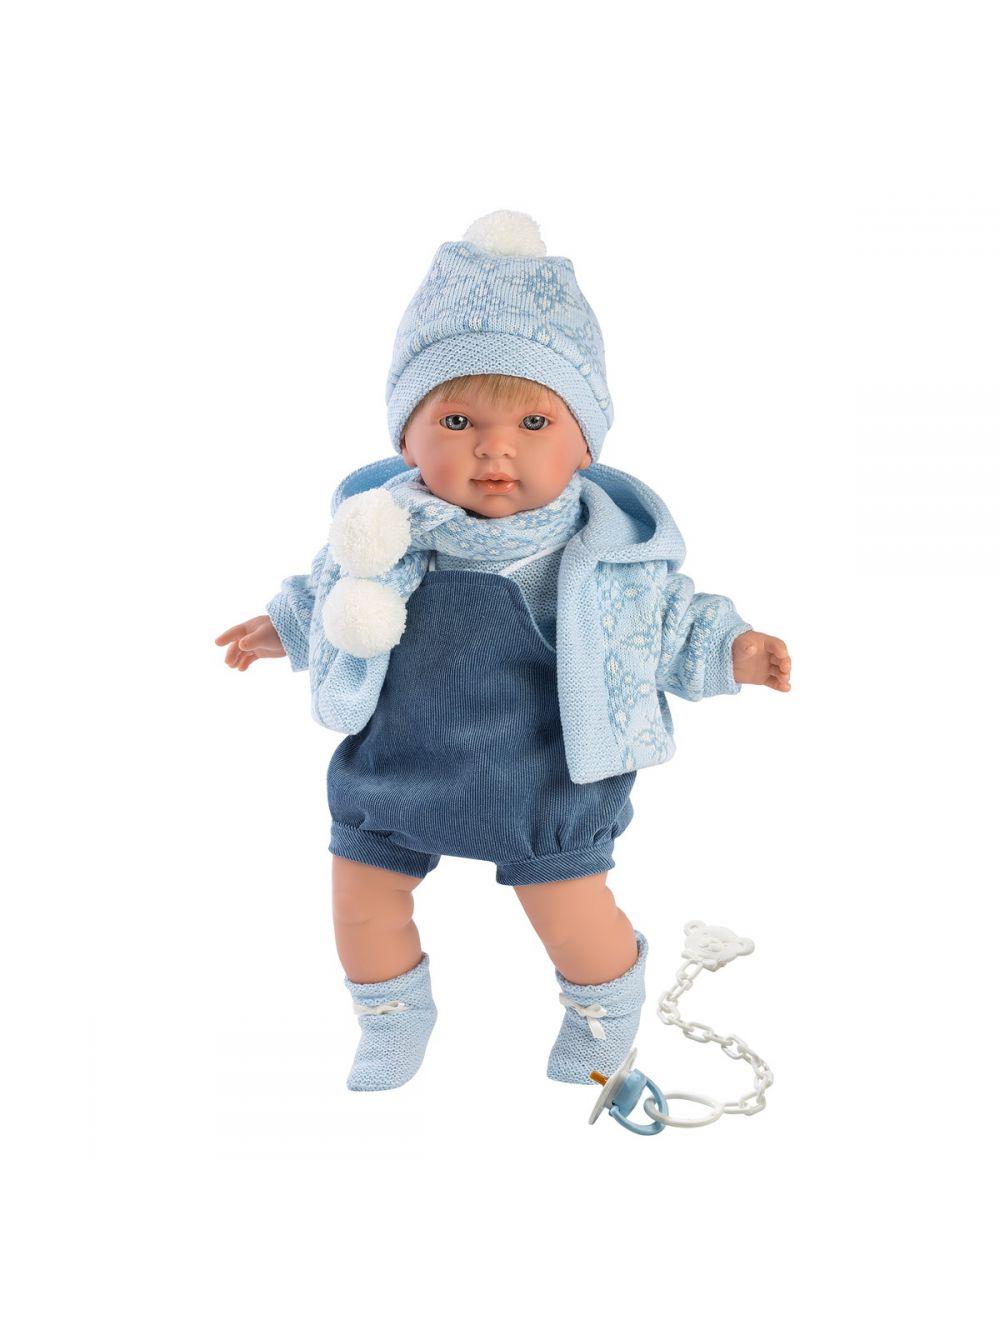 Llorens 42149 Lalka płacząca Miguel 42 cm chłopiec niebieska bluza